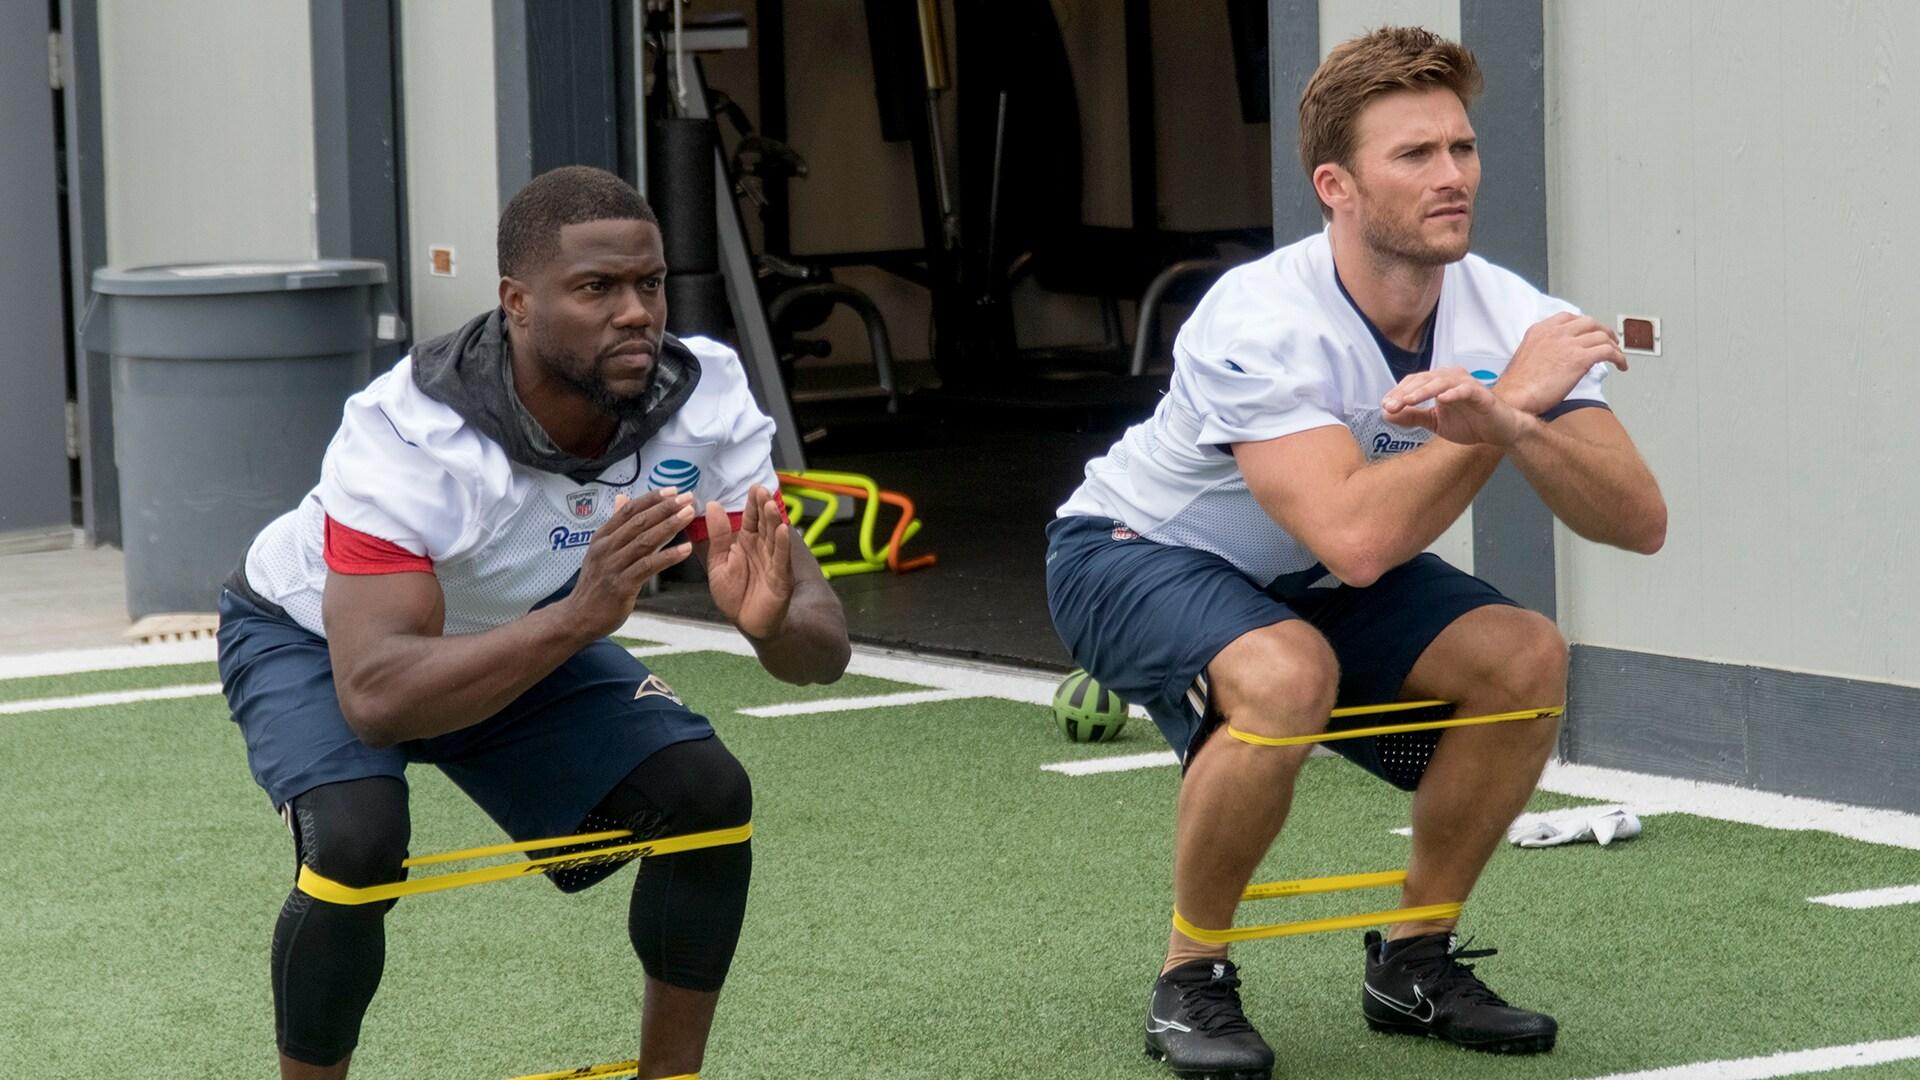 LA Rams Training Camp With Scott Eastwood